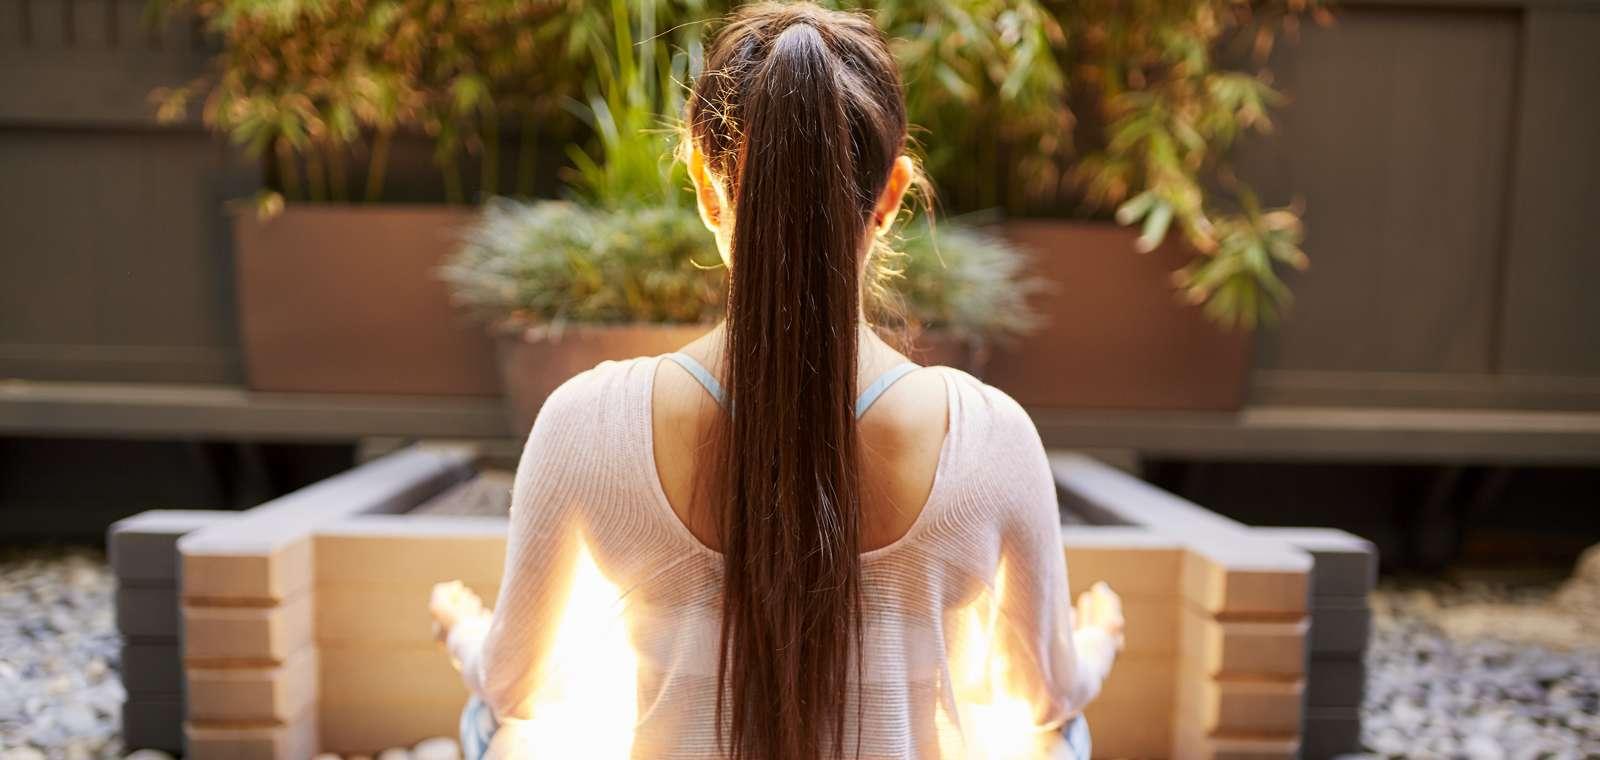 HotelKabuki_Fitness_Meditation_Garden2_Lifestyle